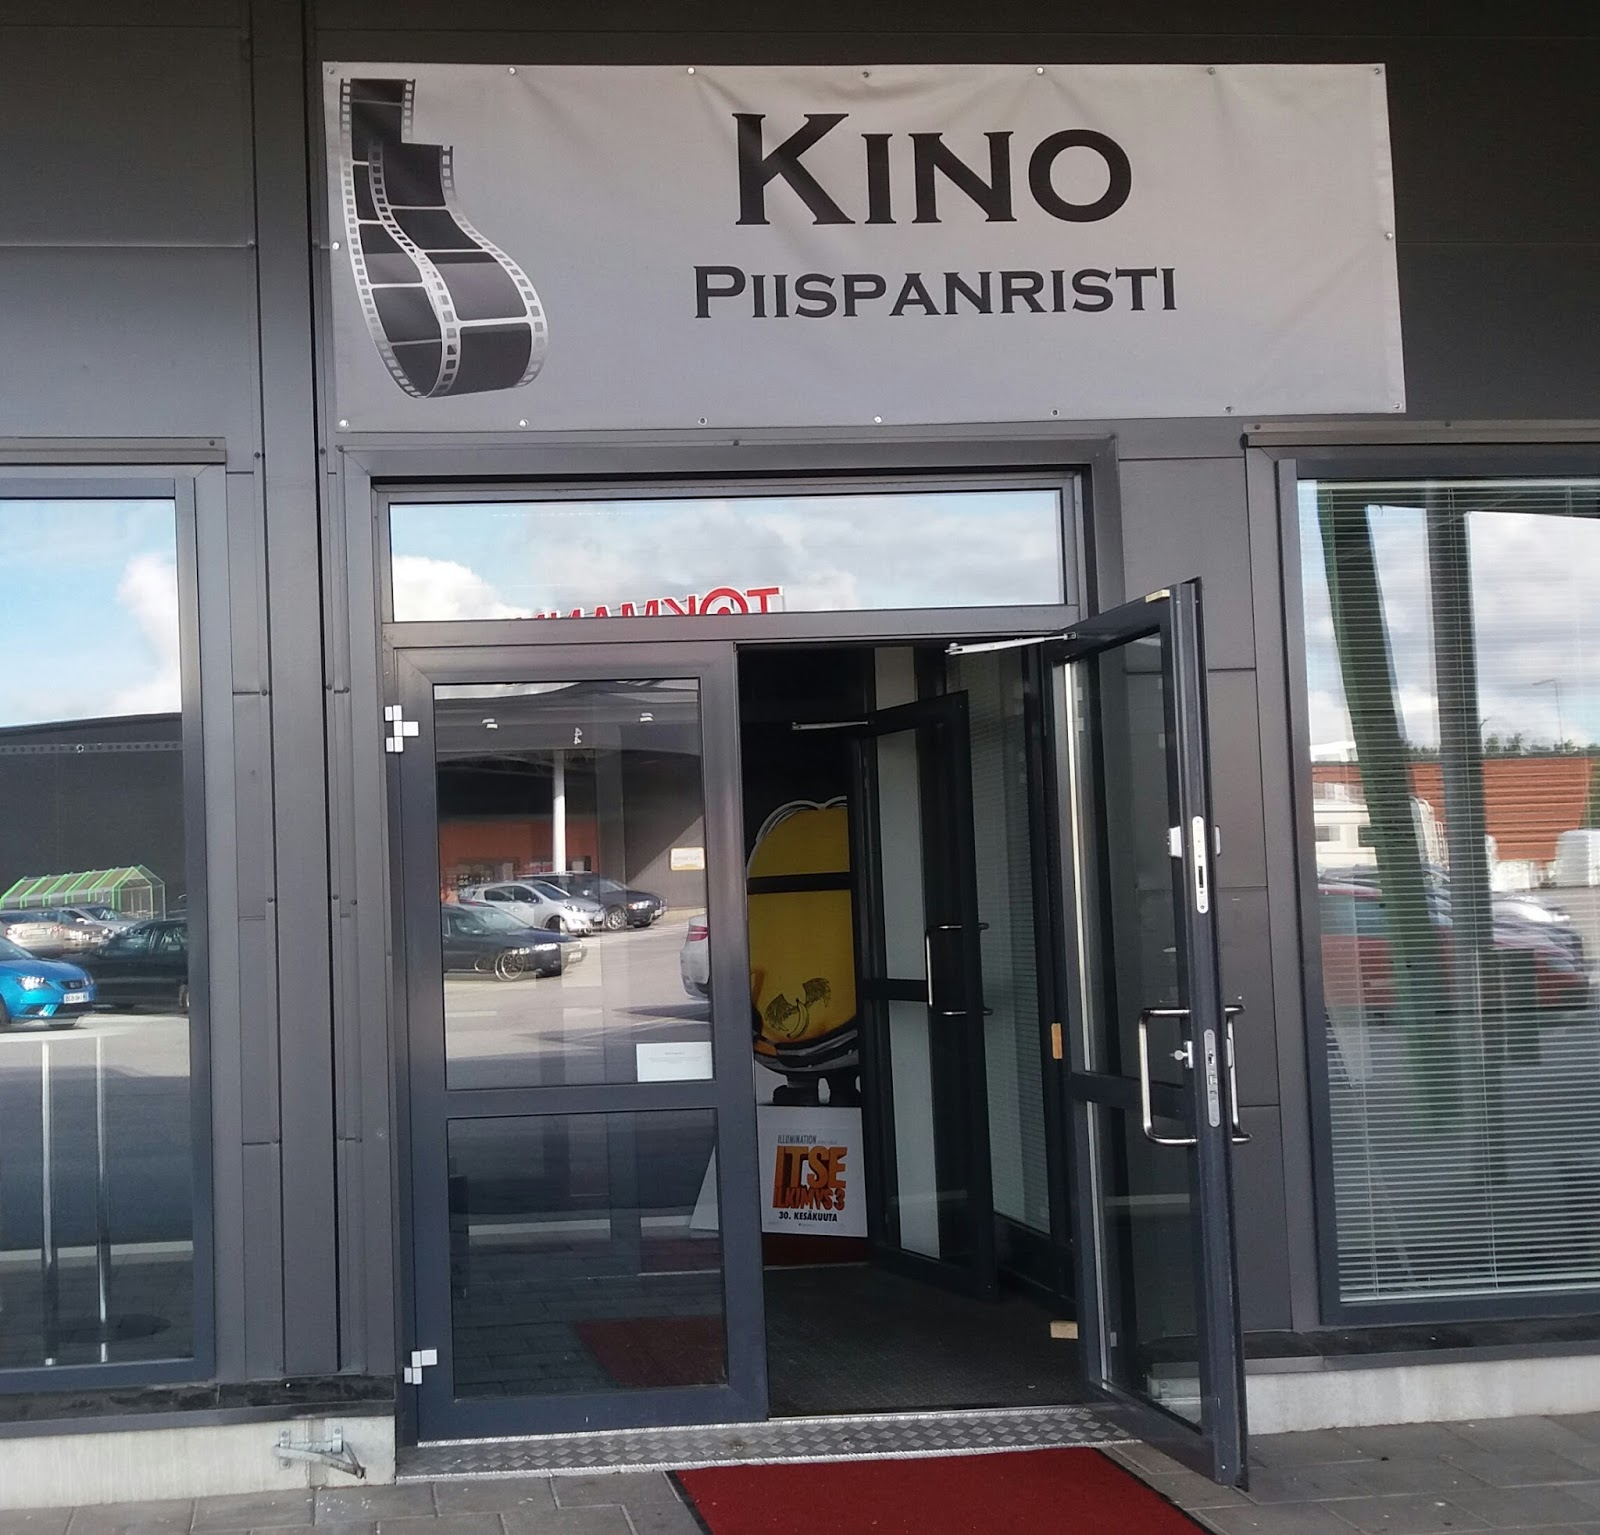 Piispanristi Kino